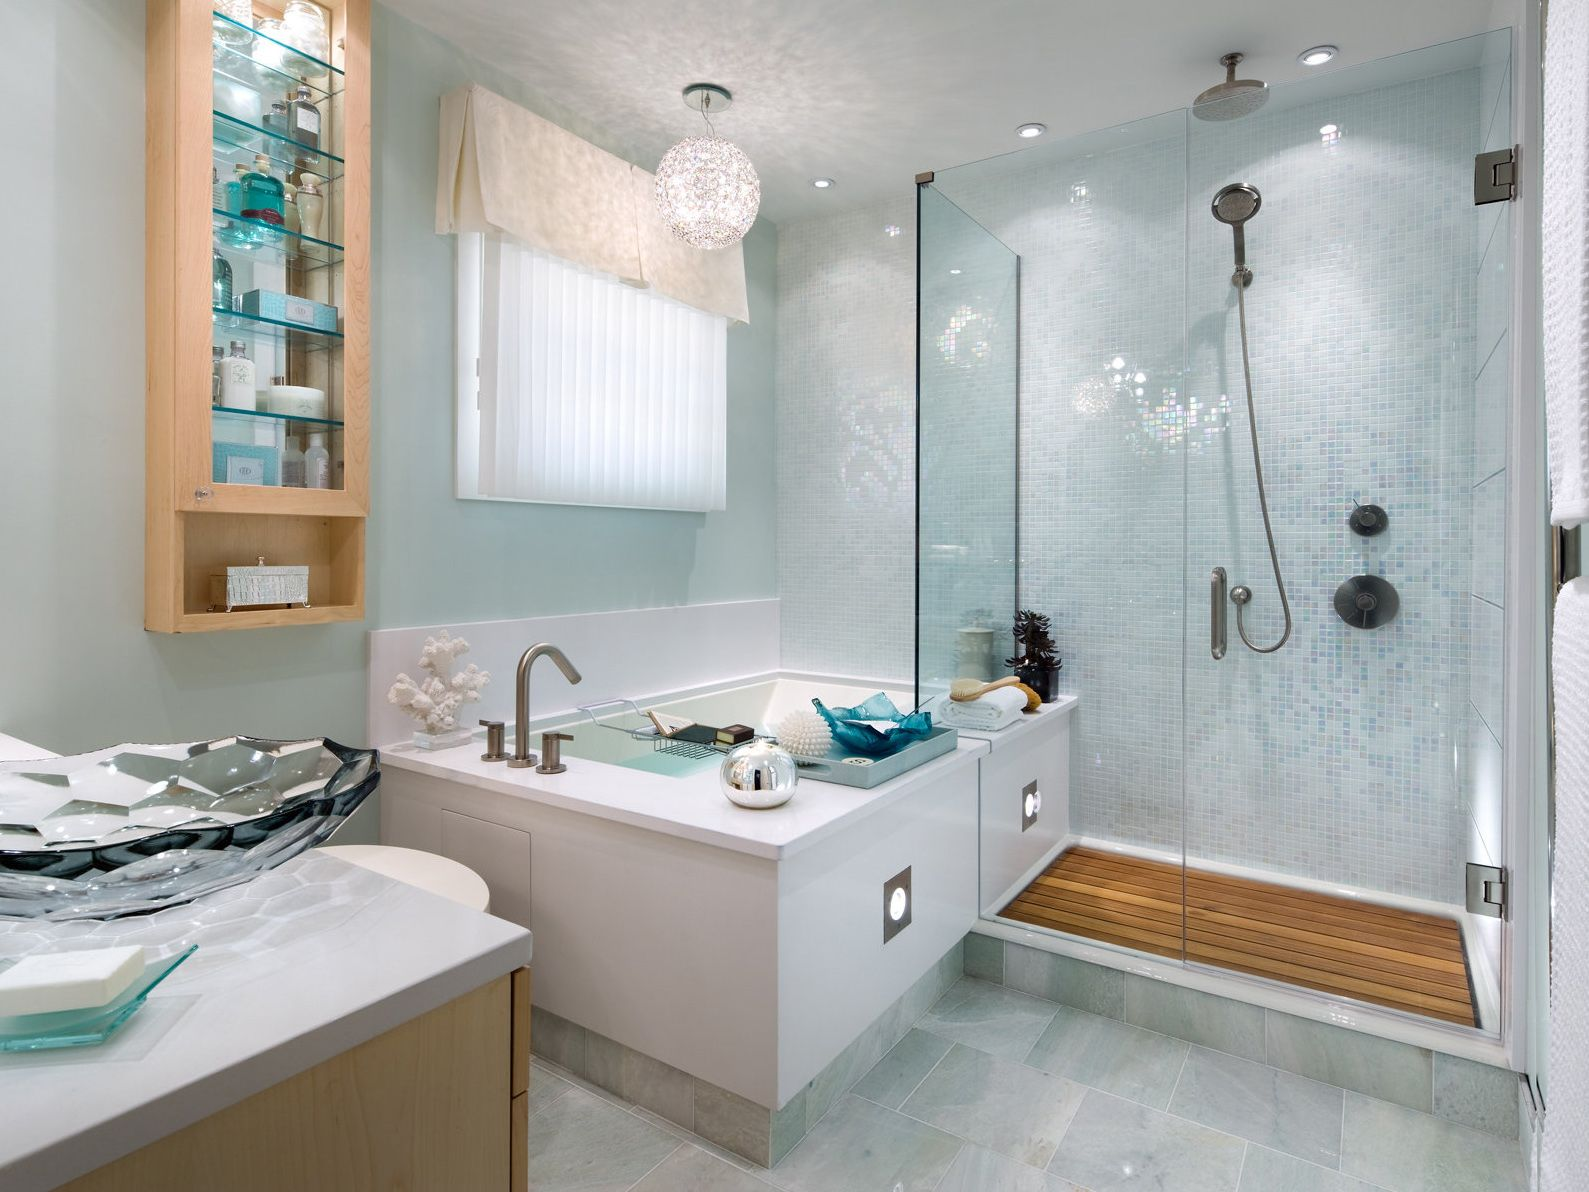 20 Beautiful Beach Style Bathroom Design Ideas | bathrooms ...